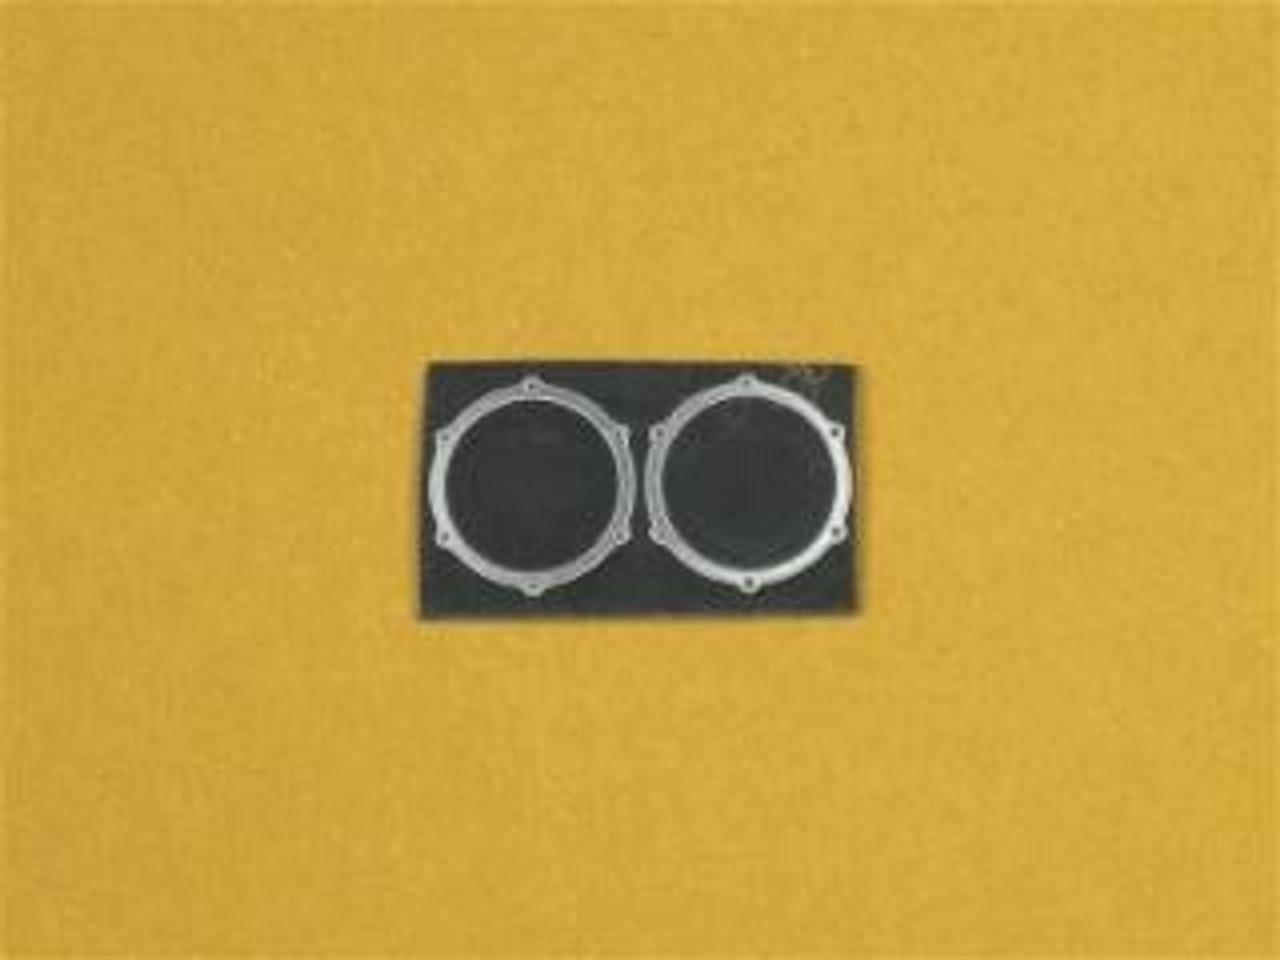 Round Exhaust Bezels Doorslammer, ProMod, 1/25